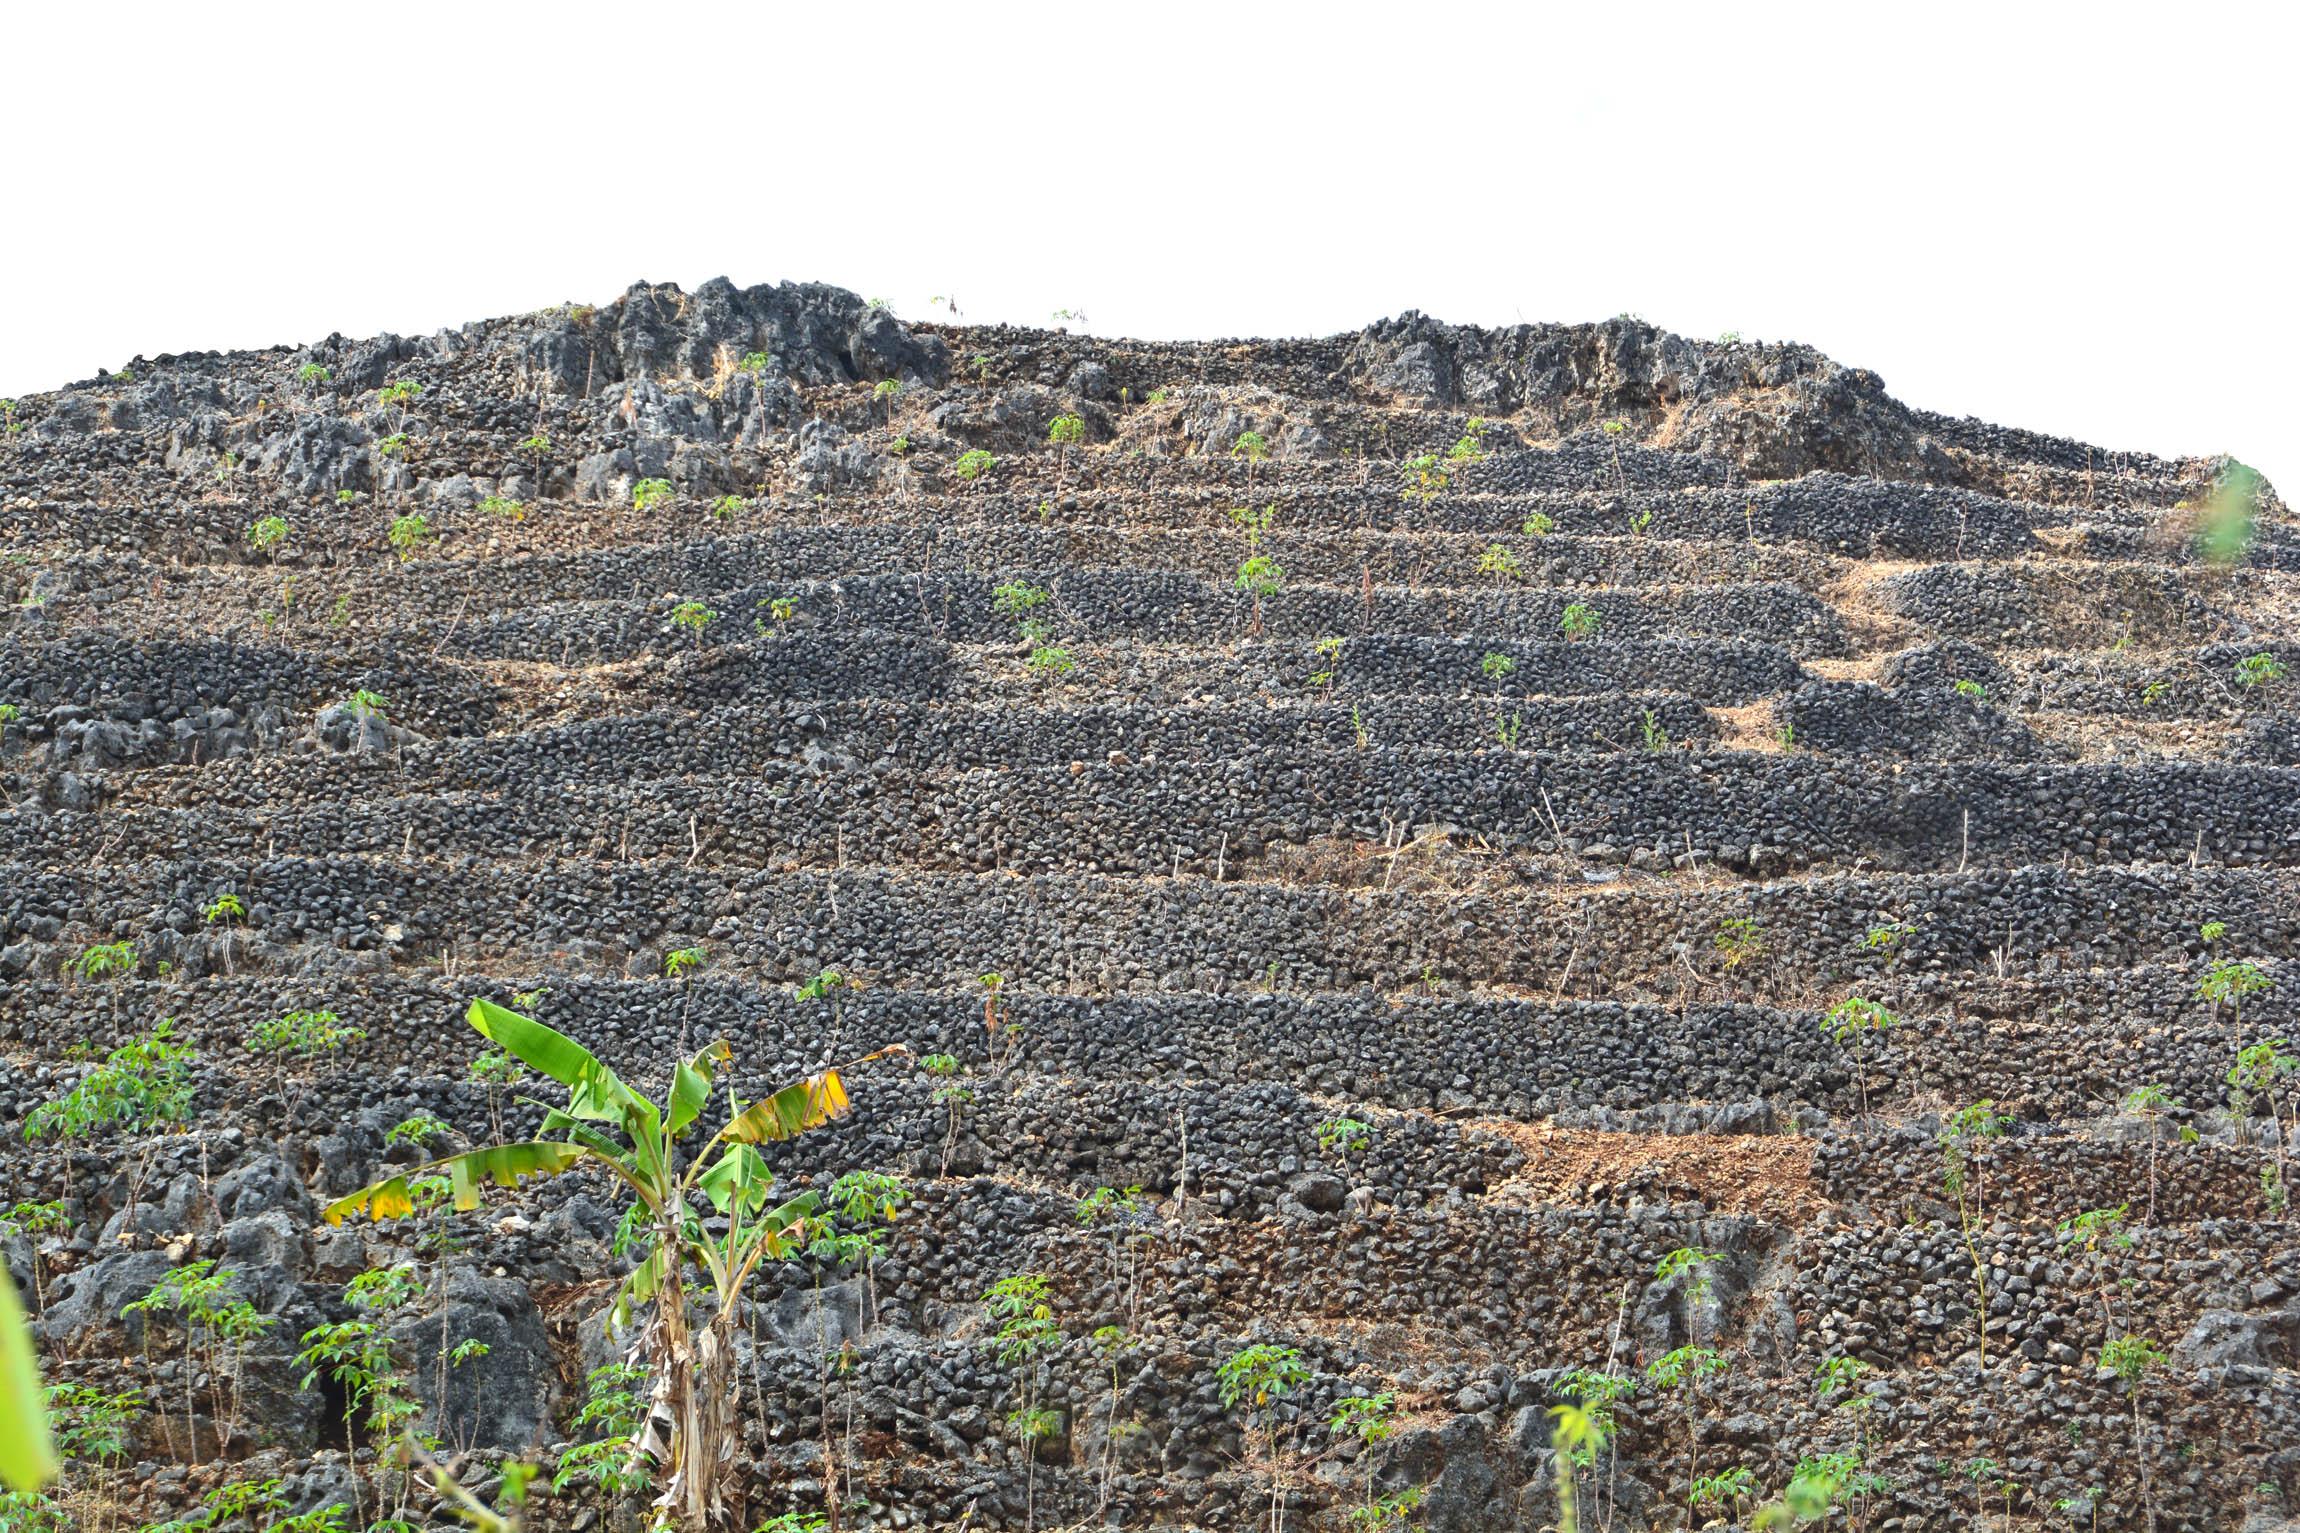 Lahan pertanian tegalan-karang di daerah Rongkop.[Foto:WG]